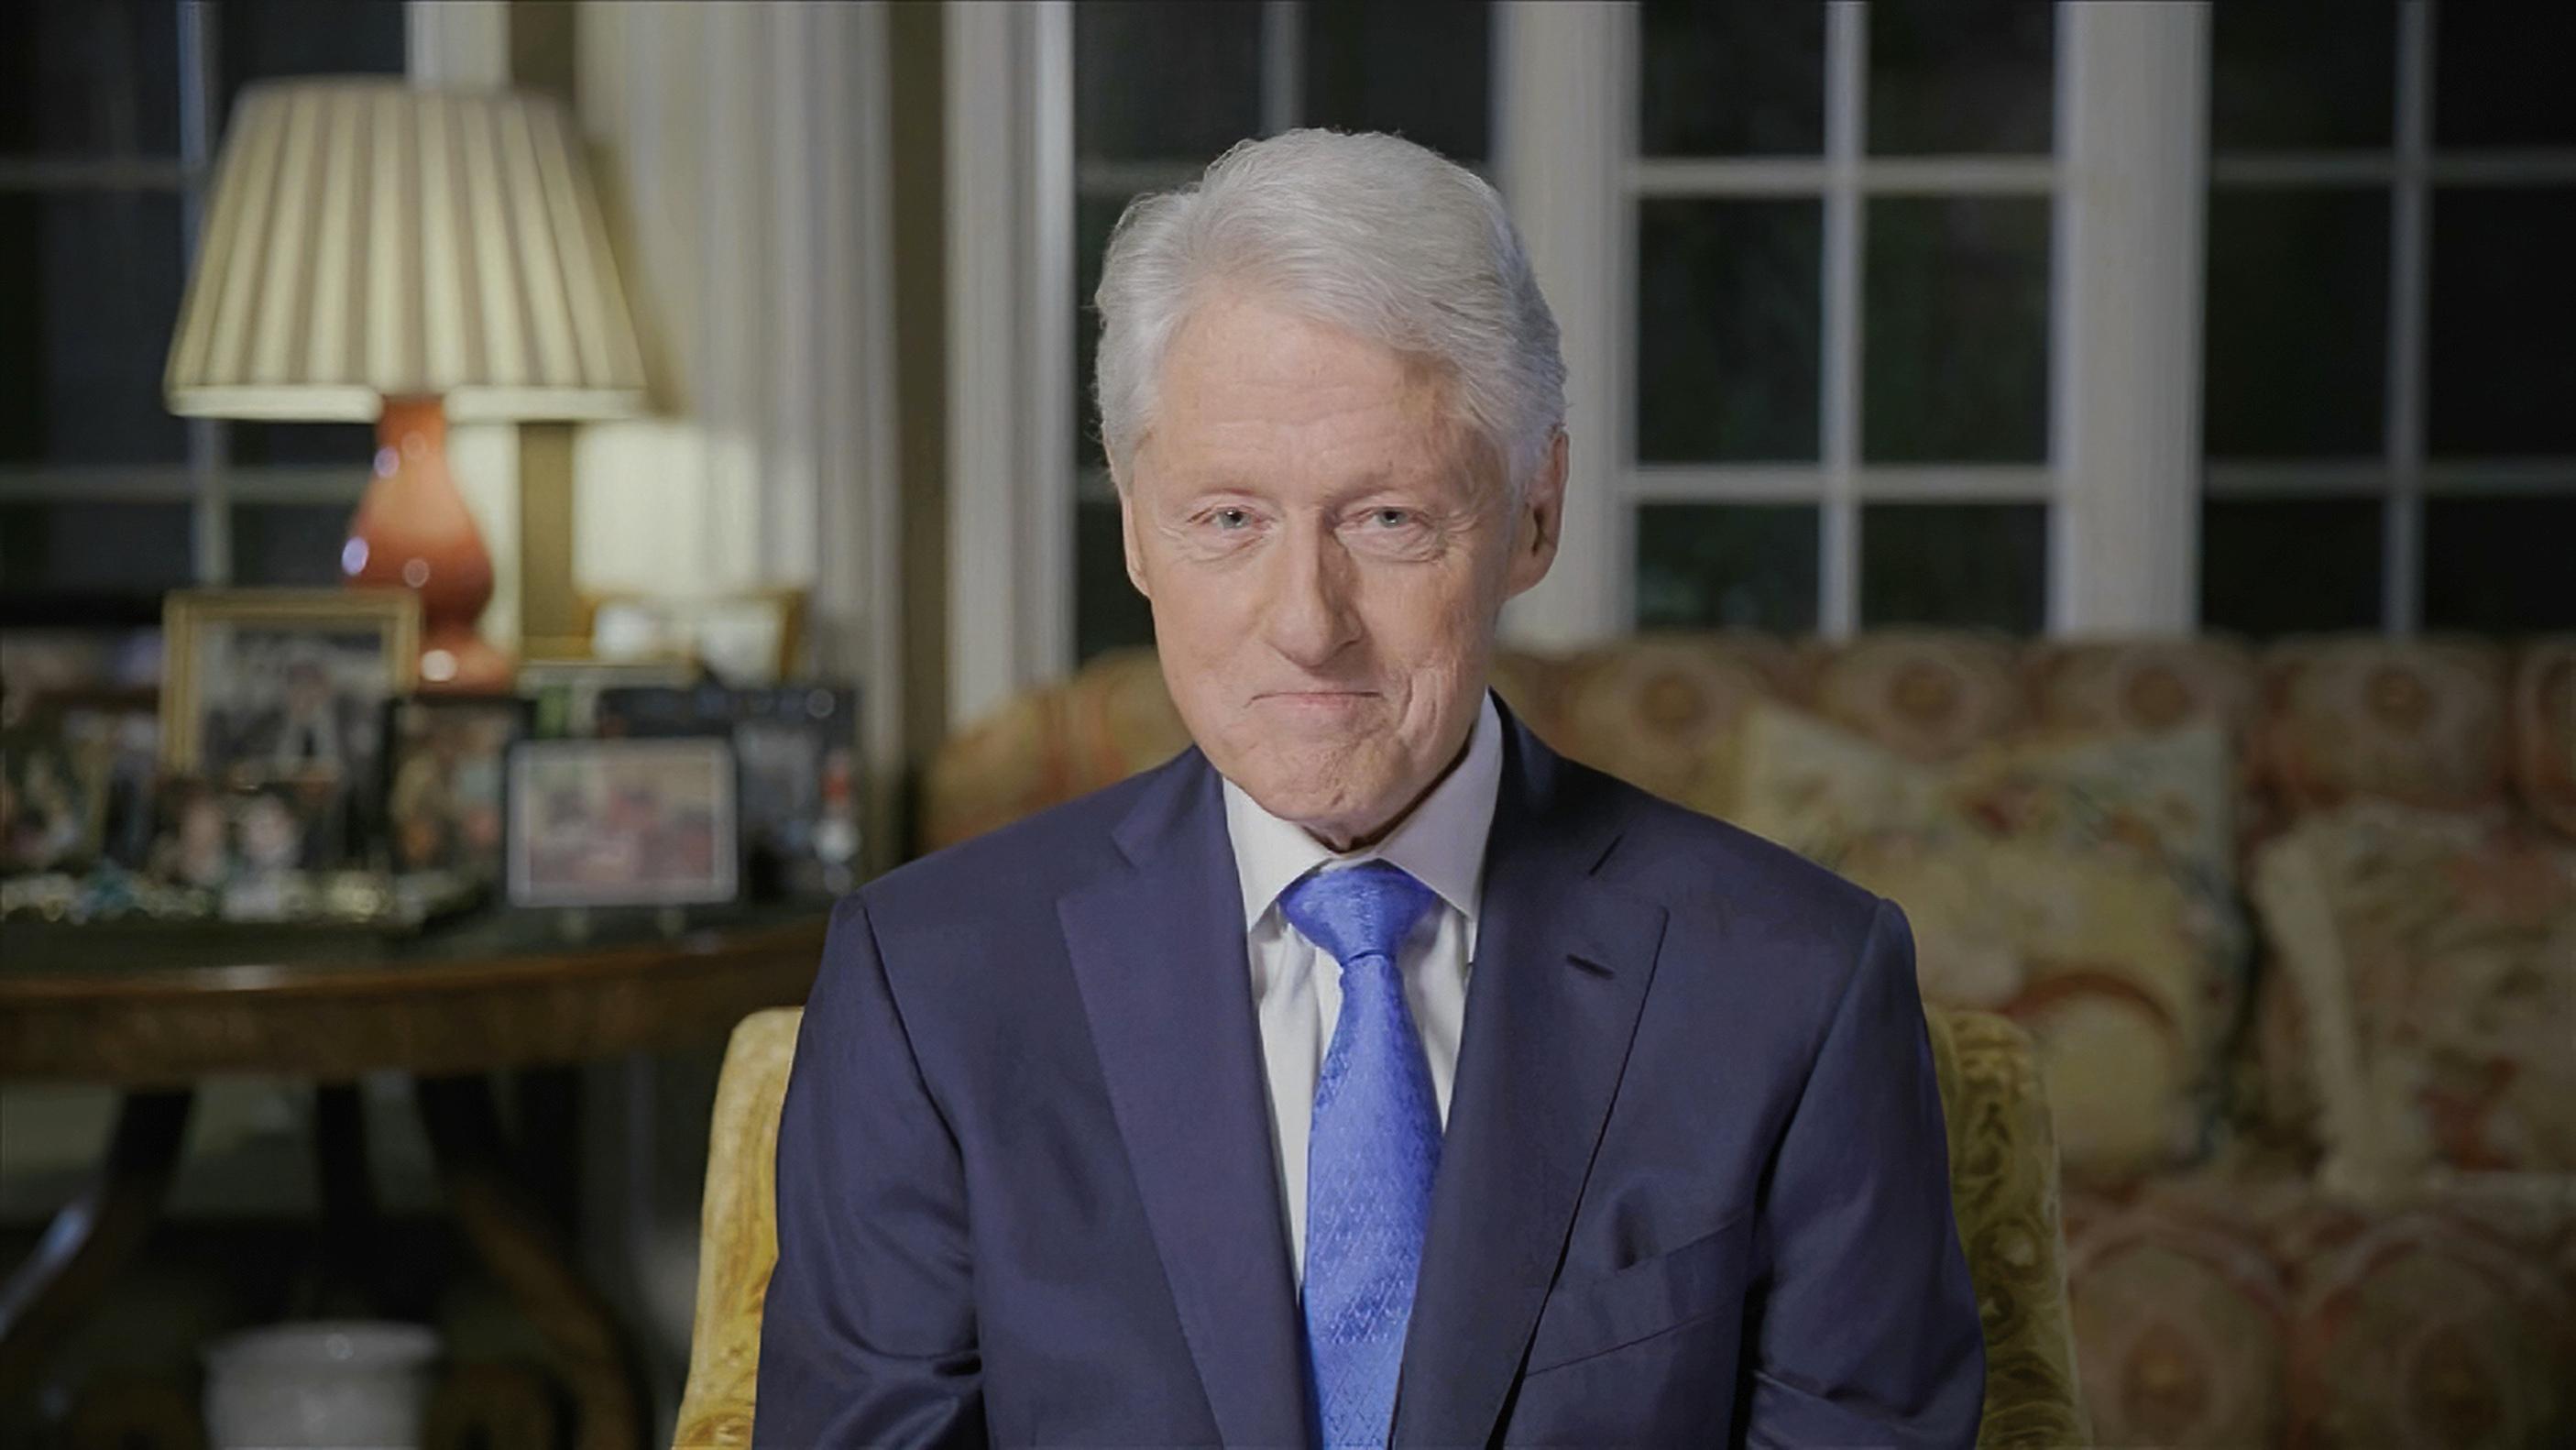 Former President Bill Clinton To Launch Podcast For iHeartMedia – Deadline